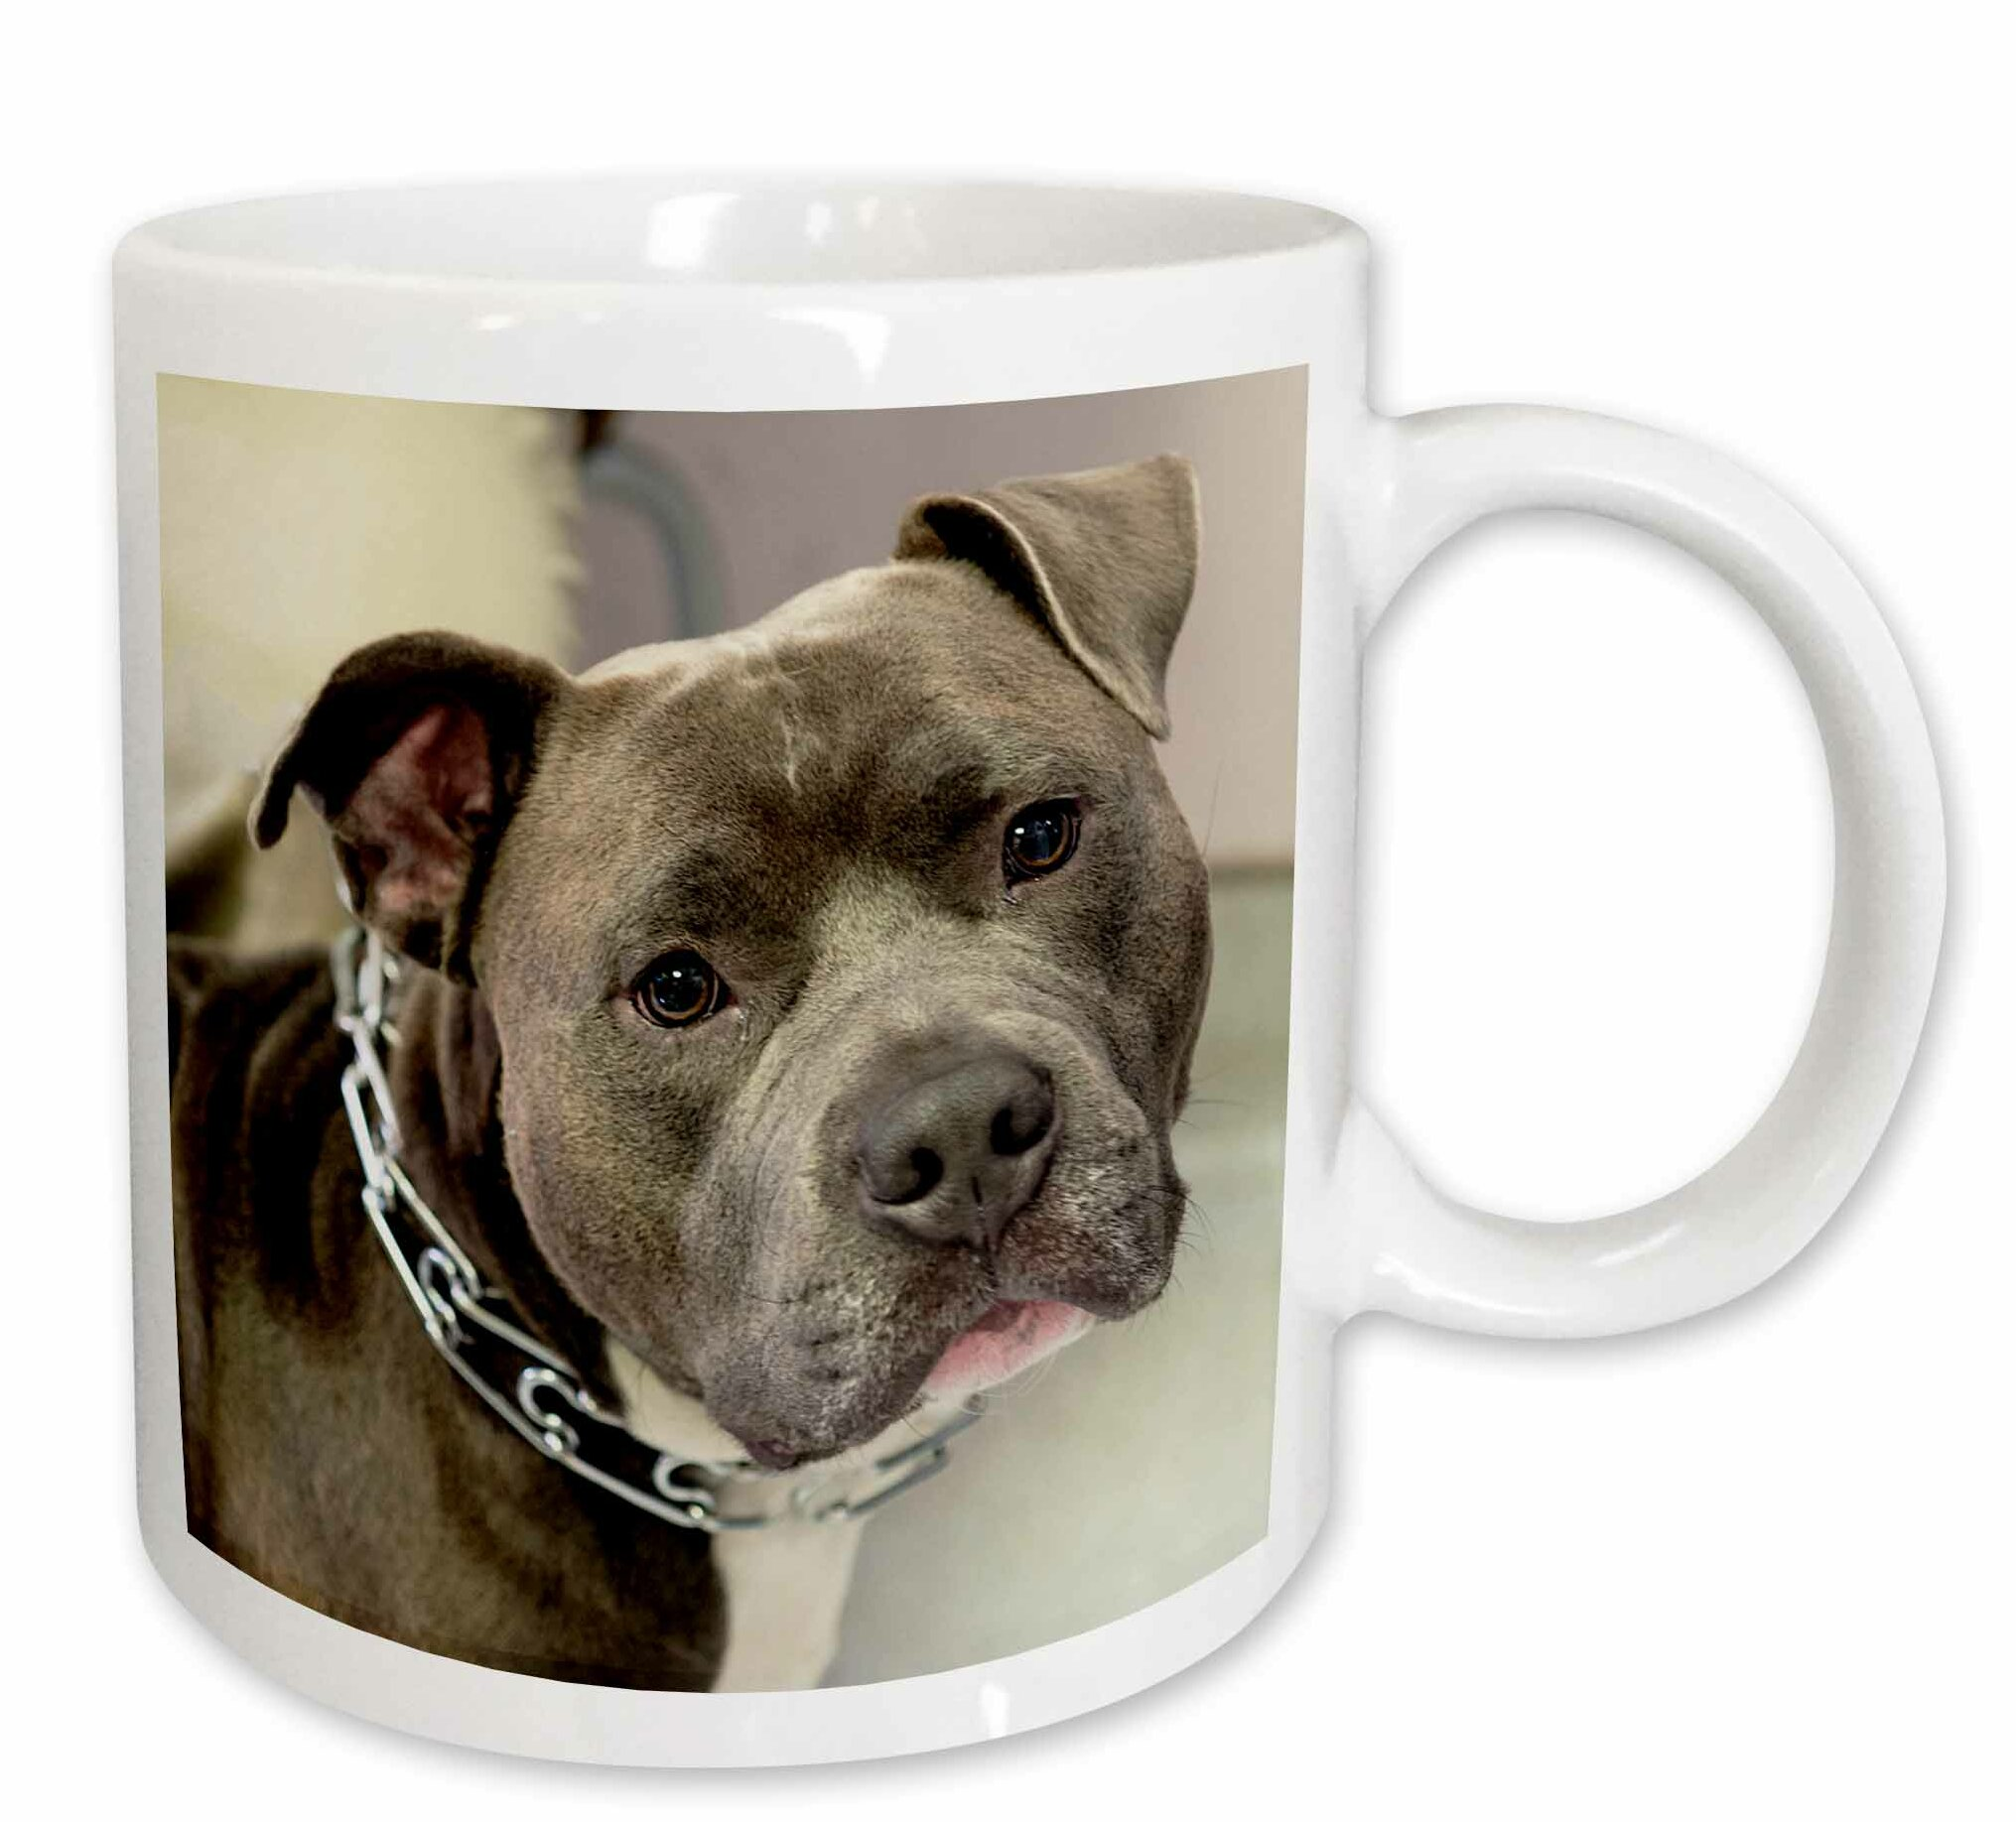 Pitbull With Chain Collar Coffee Mug